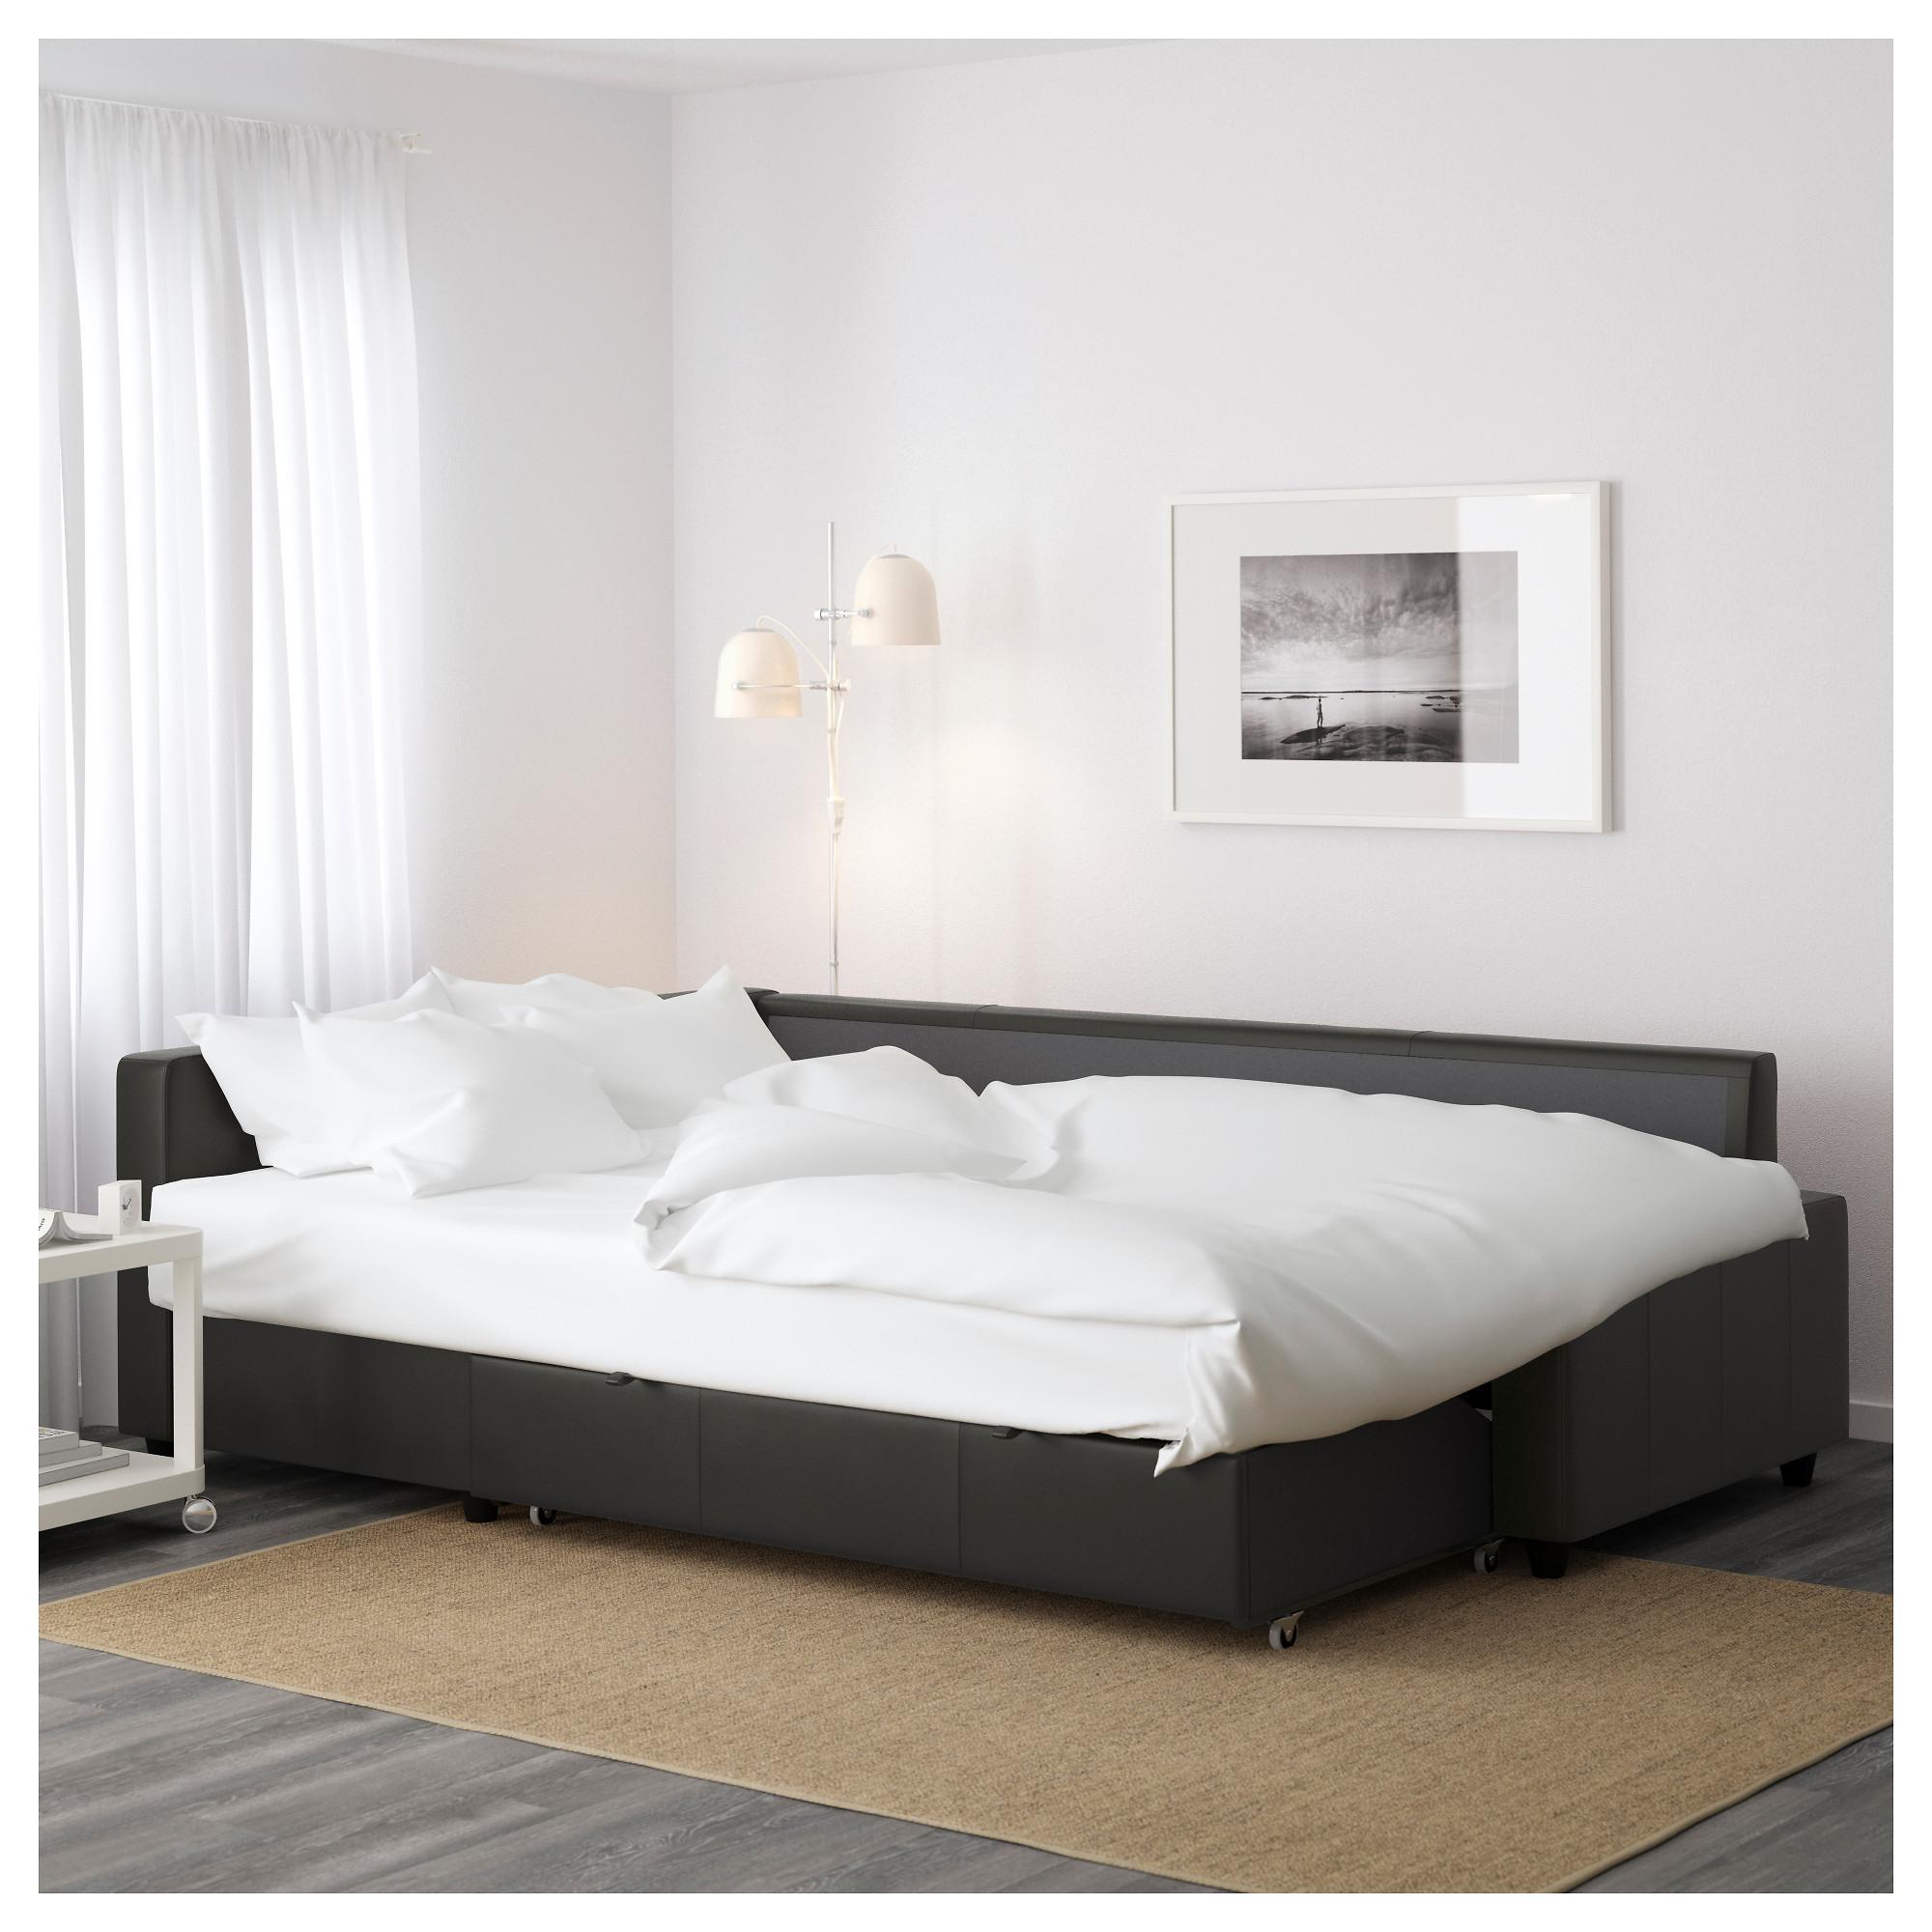 Friheten Corner Sofa Bed With Storage – Bomstad Black – Ikea Intended For Ikea Corner Sofa Bed With Storage (Image 1 of 20)